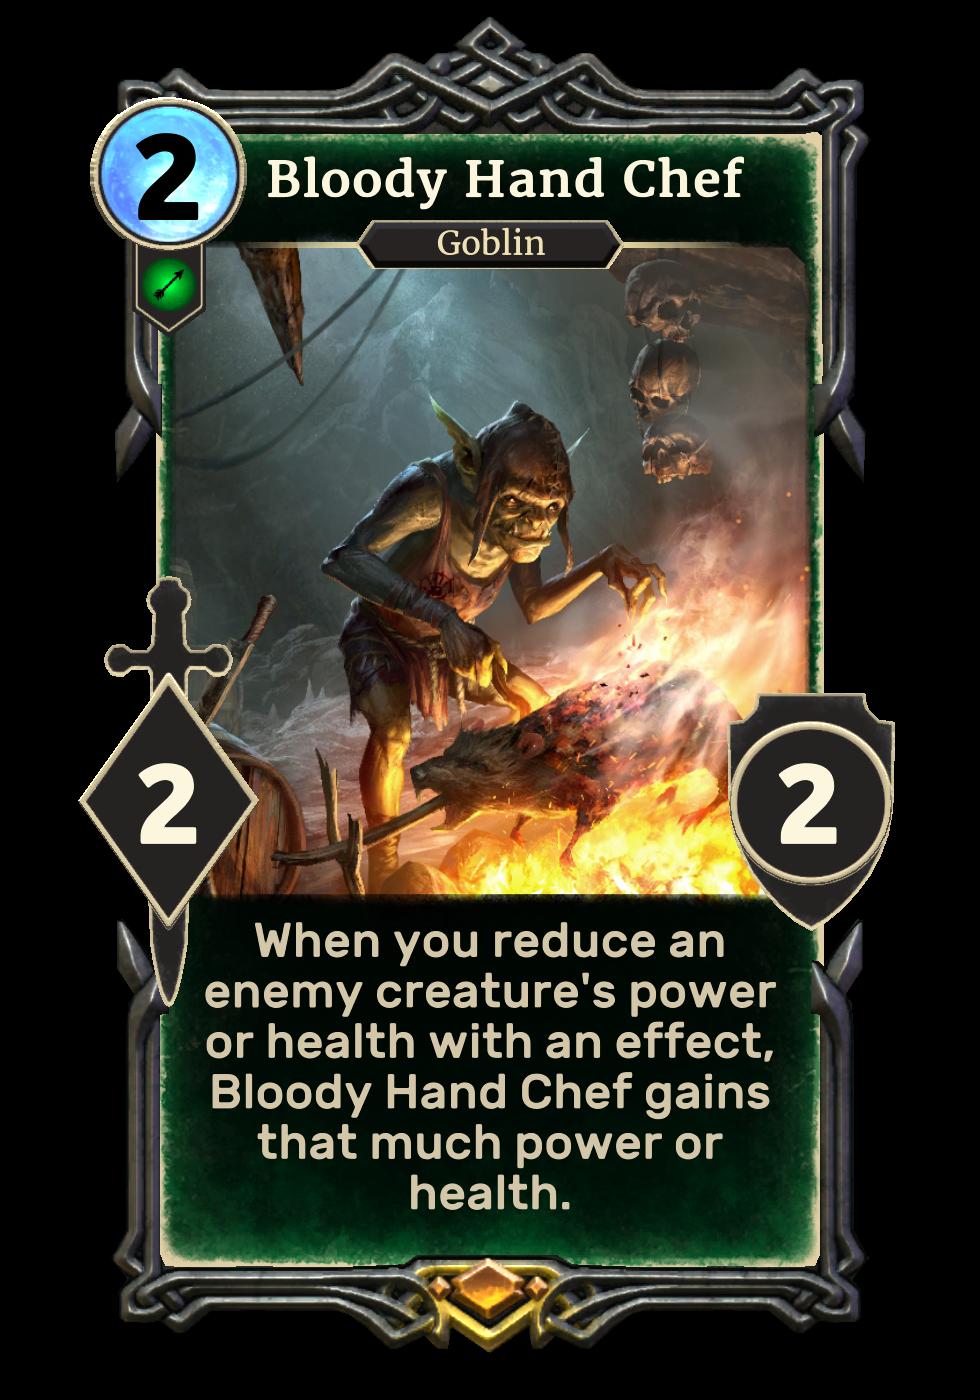 Bloody Hand Chef